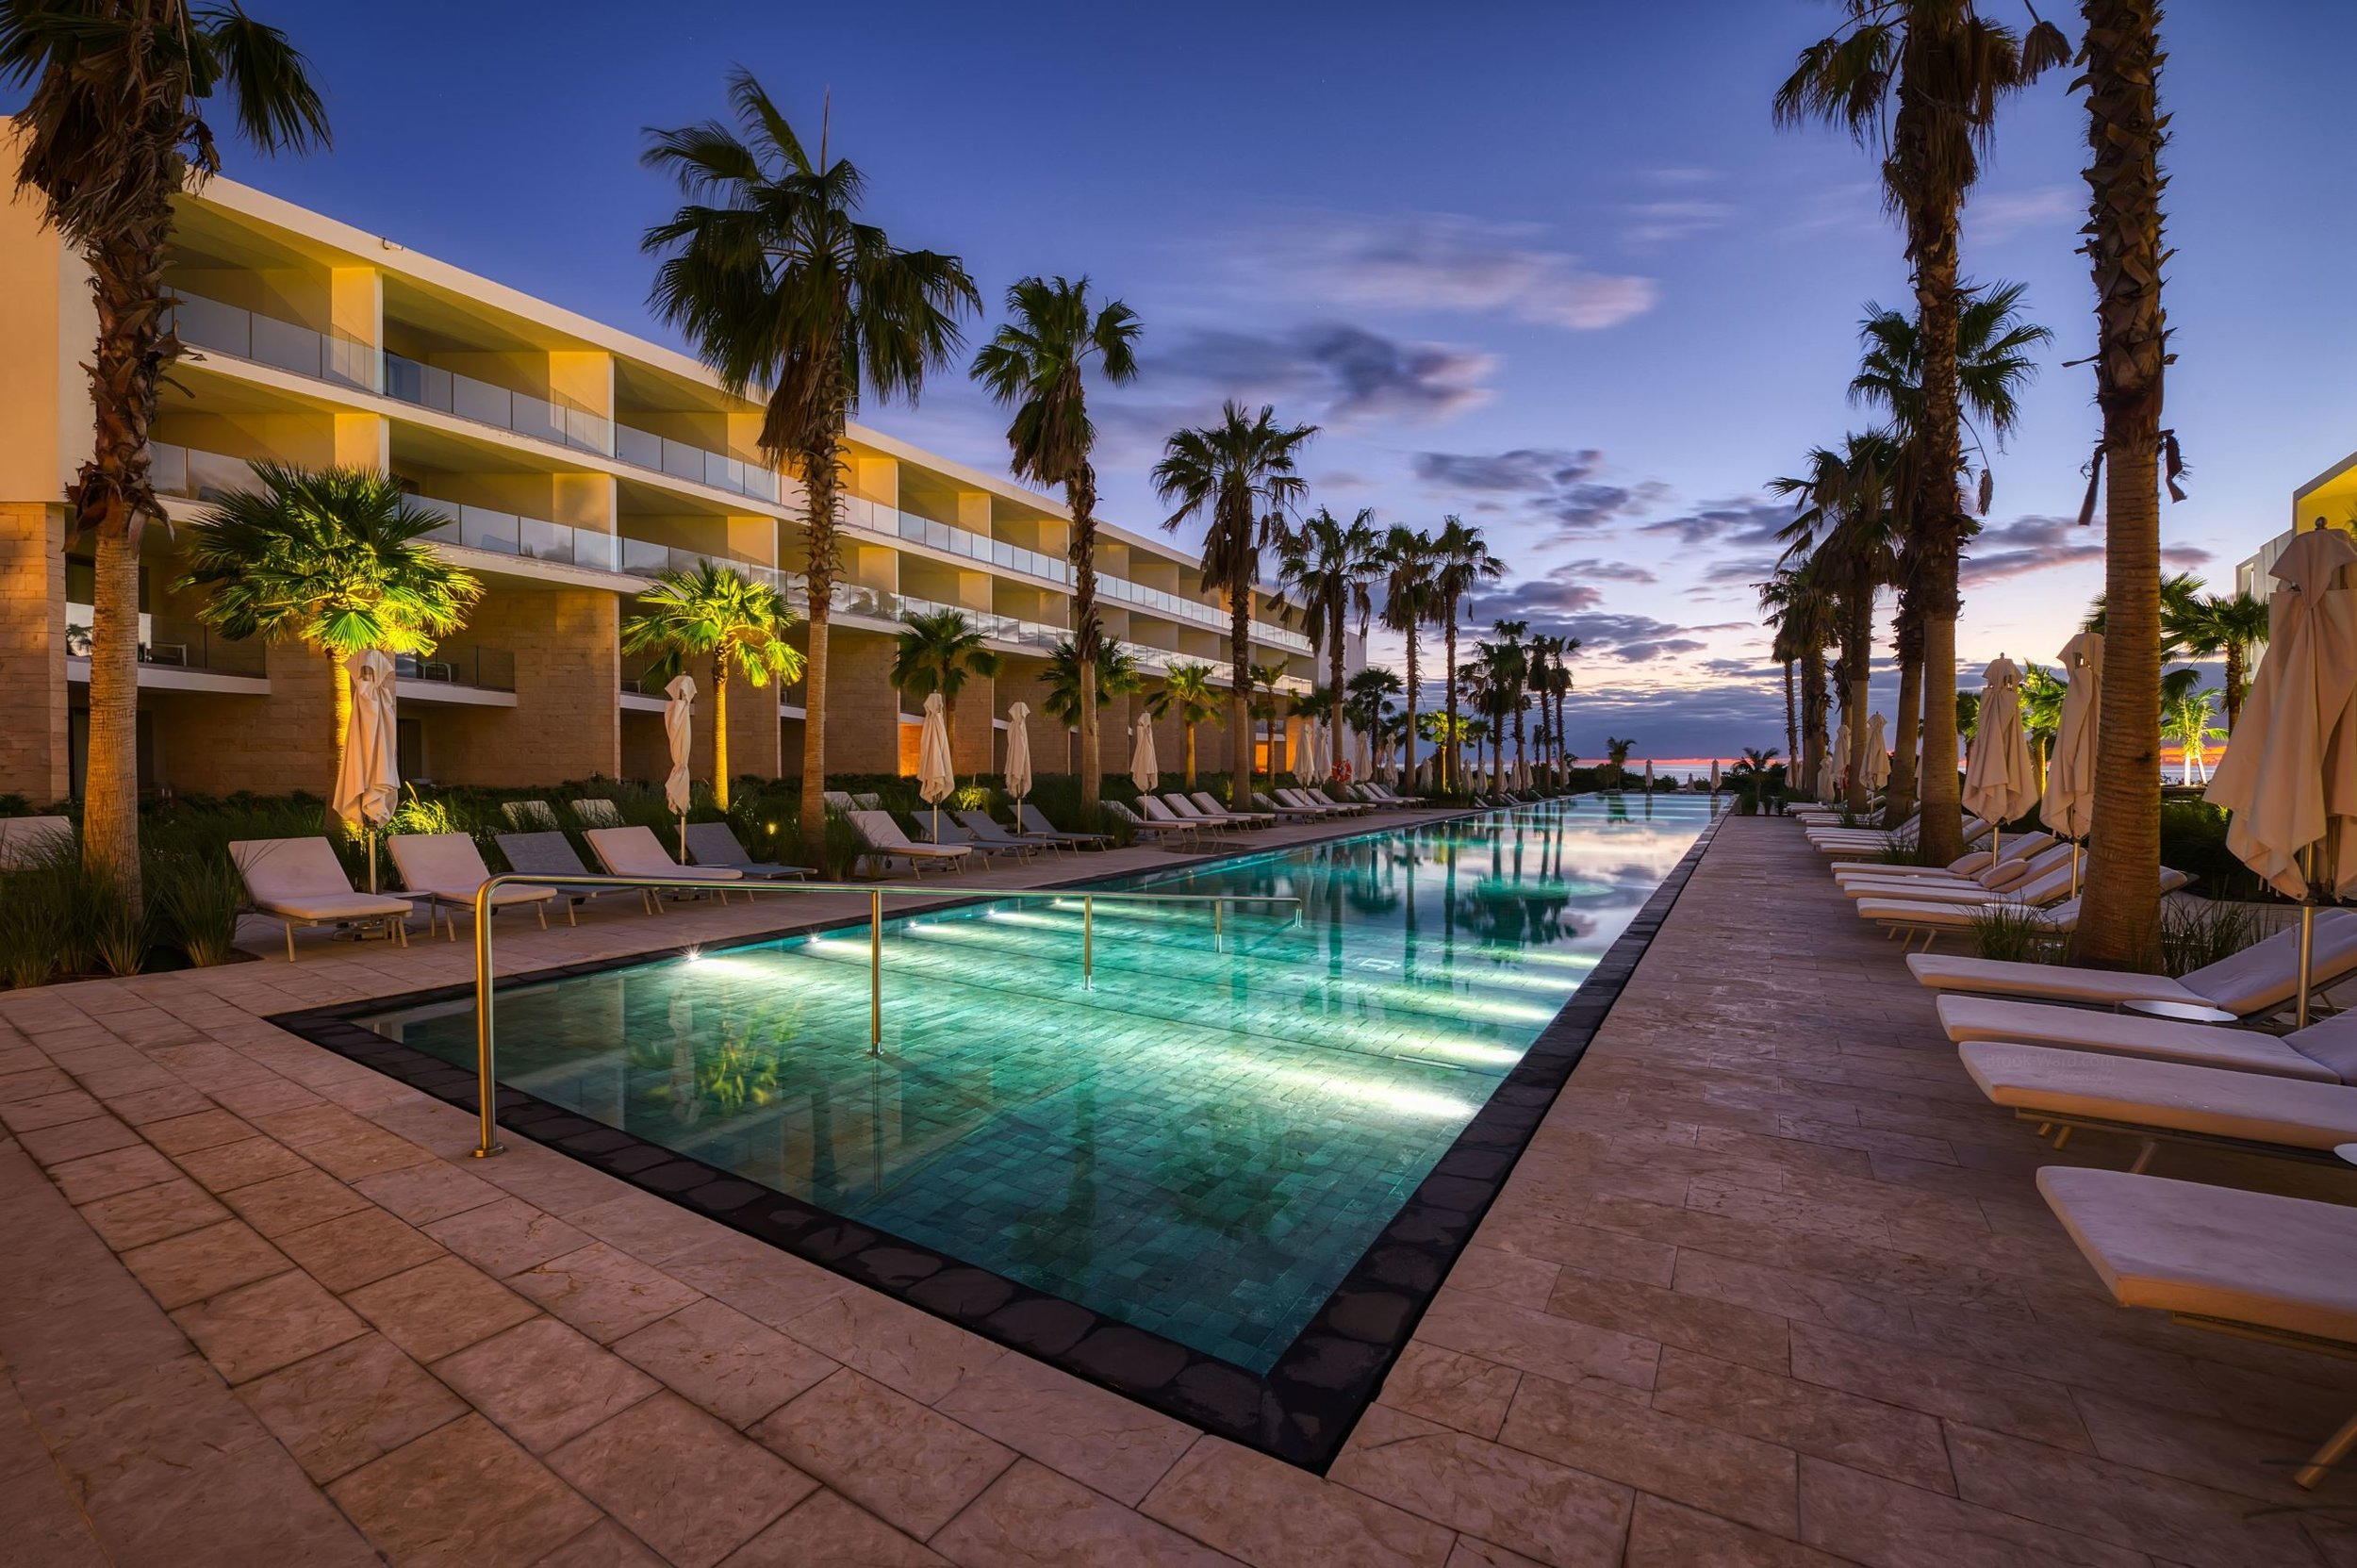 Cancun Colorful Pool